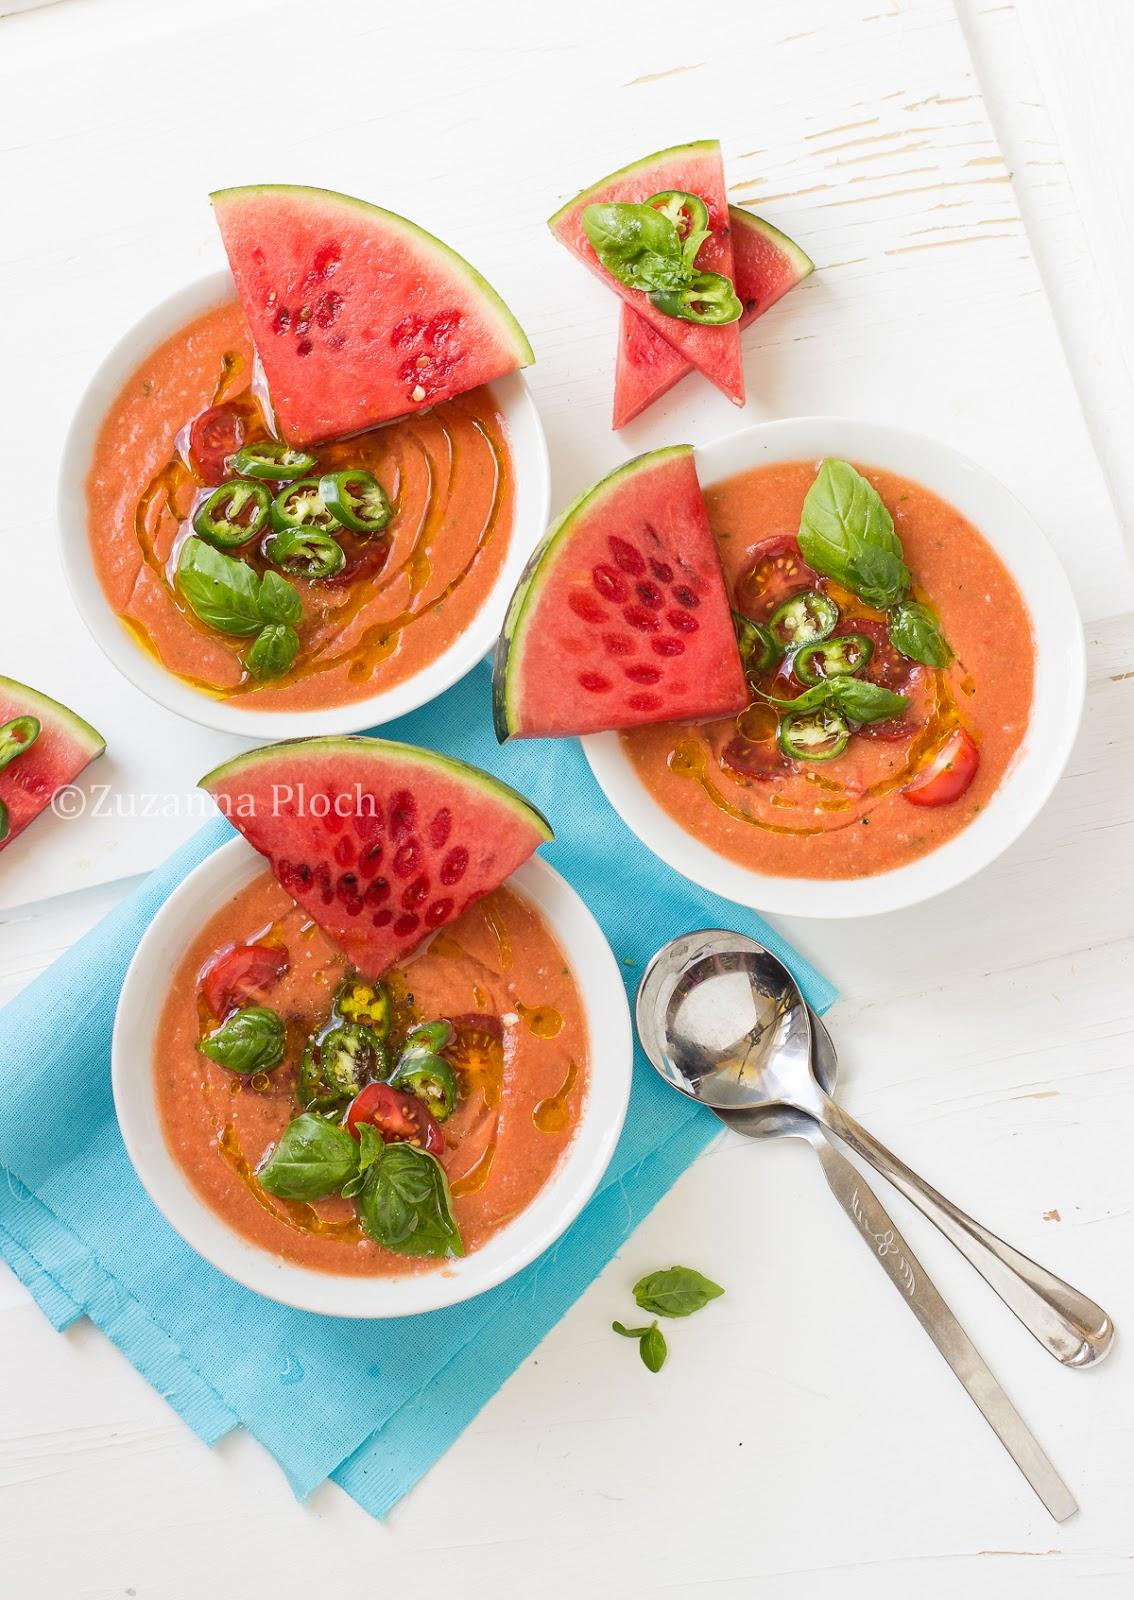 Watermelon gazpacho - Food photography by Zuzanna Ploch, fotografia kulinarna